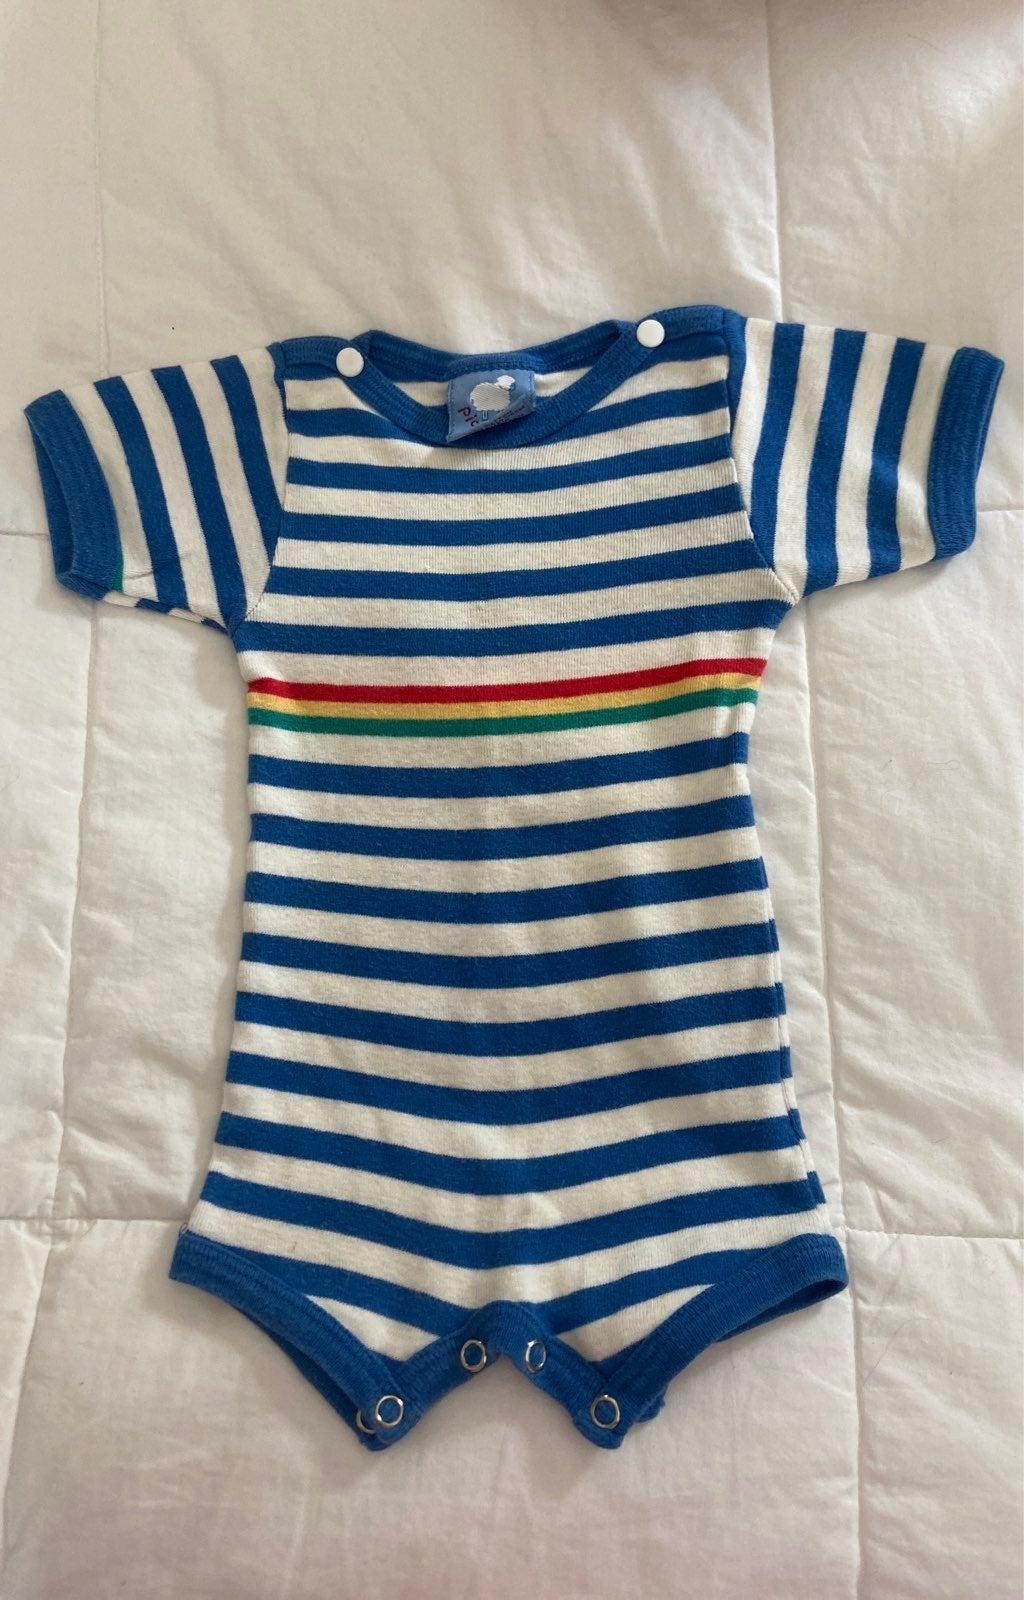 Vintage Picco Knit Striped Baby Onesie